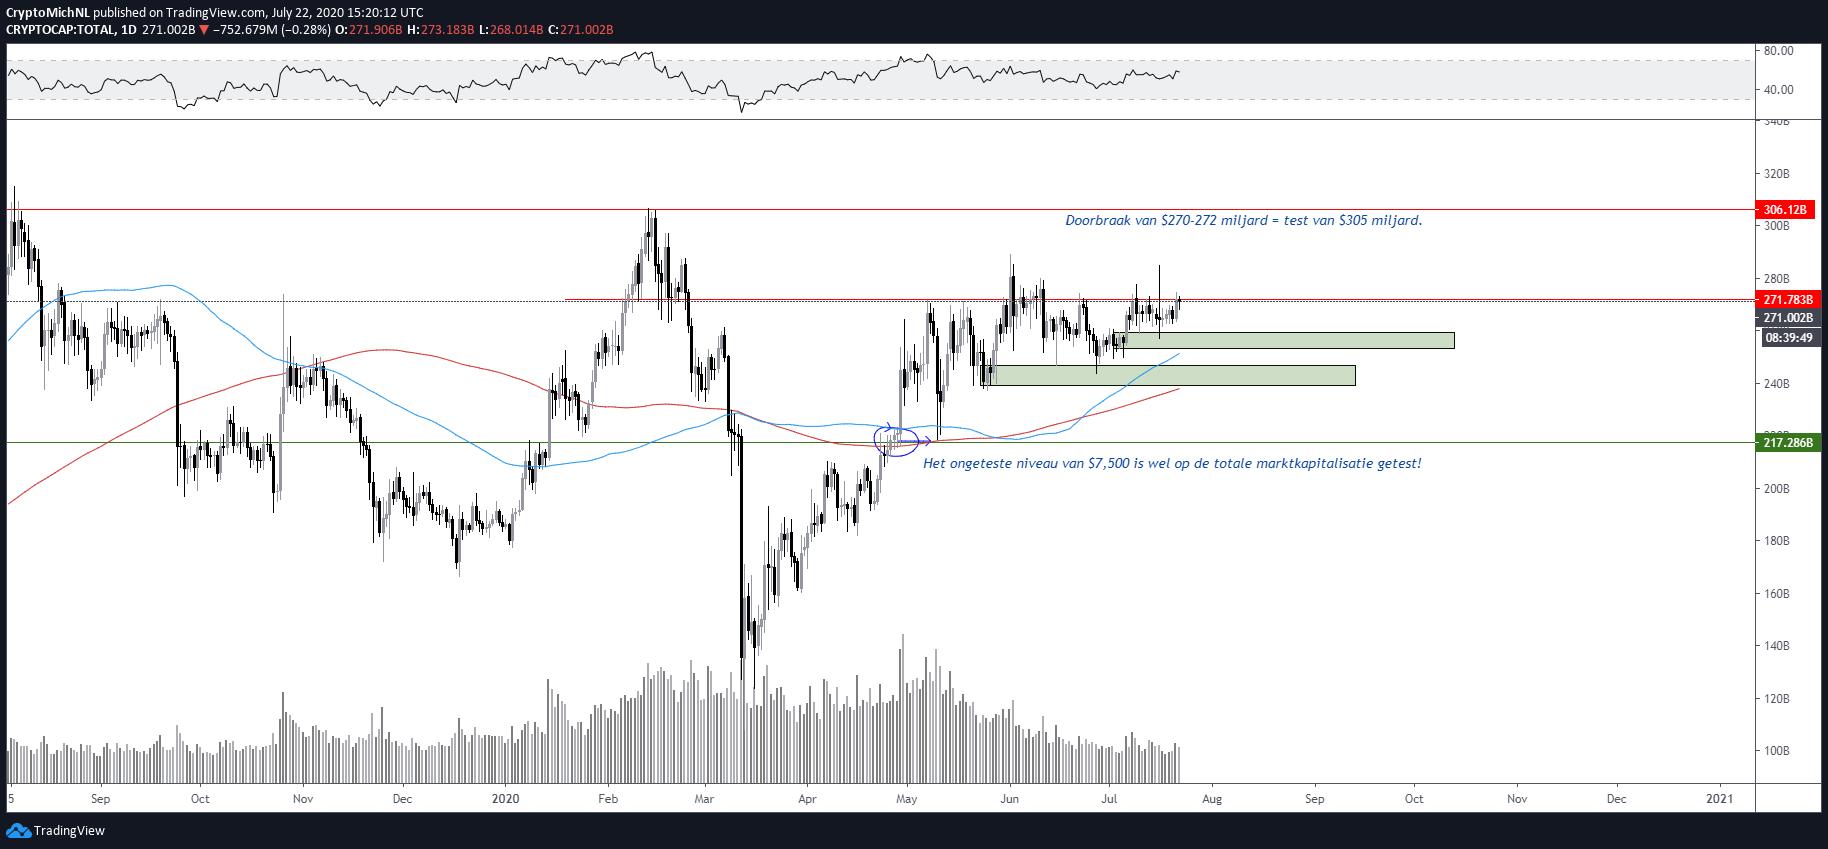 Totale marktkapitalisatie crypto